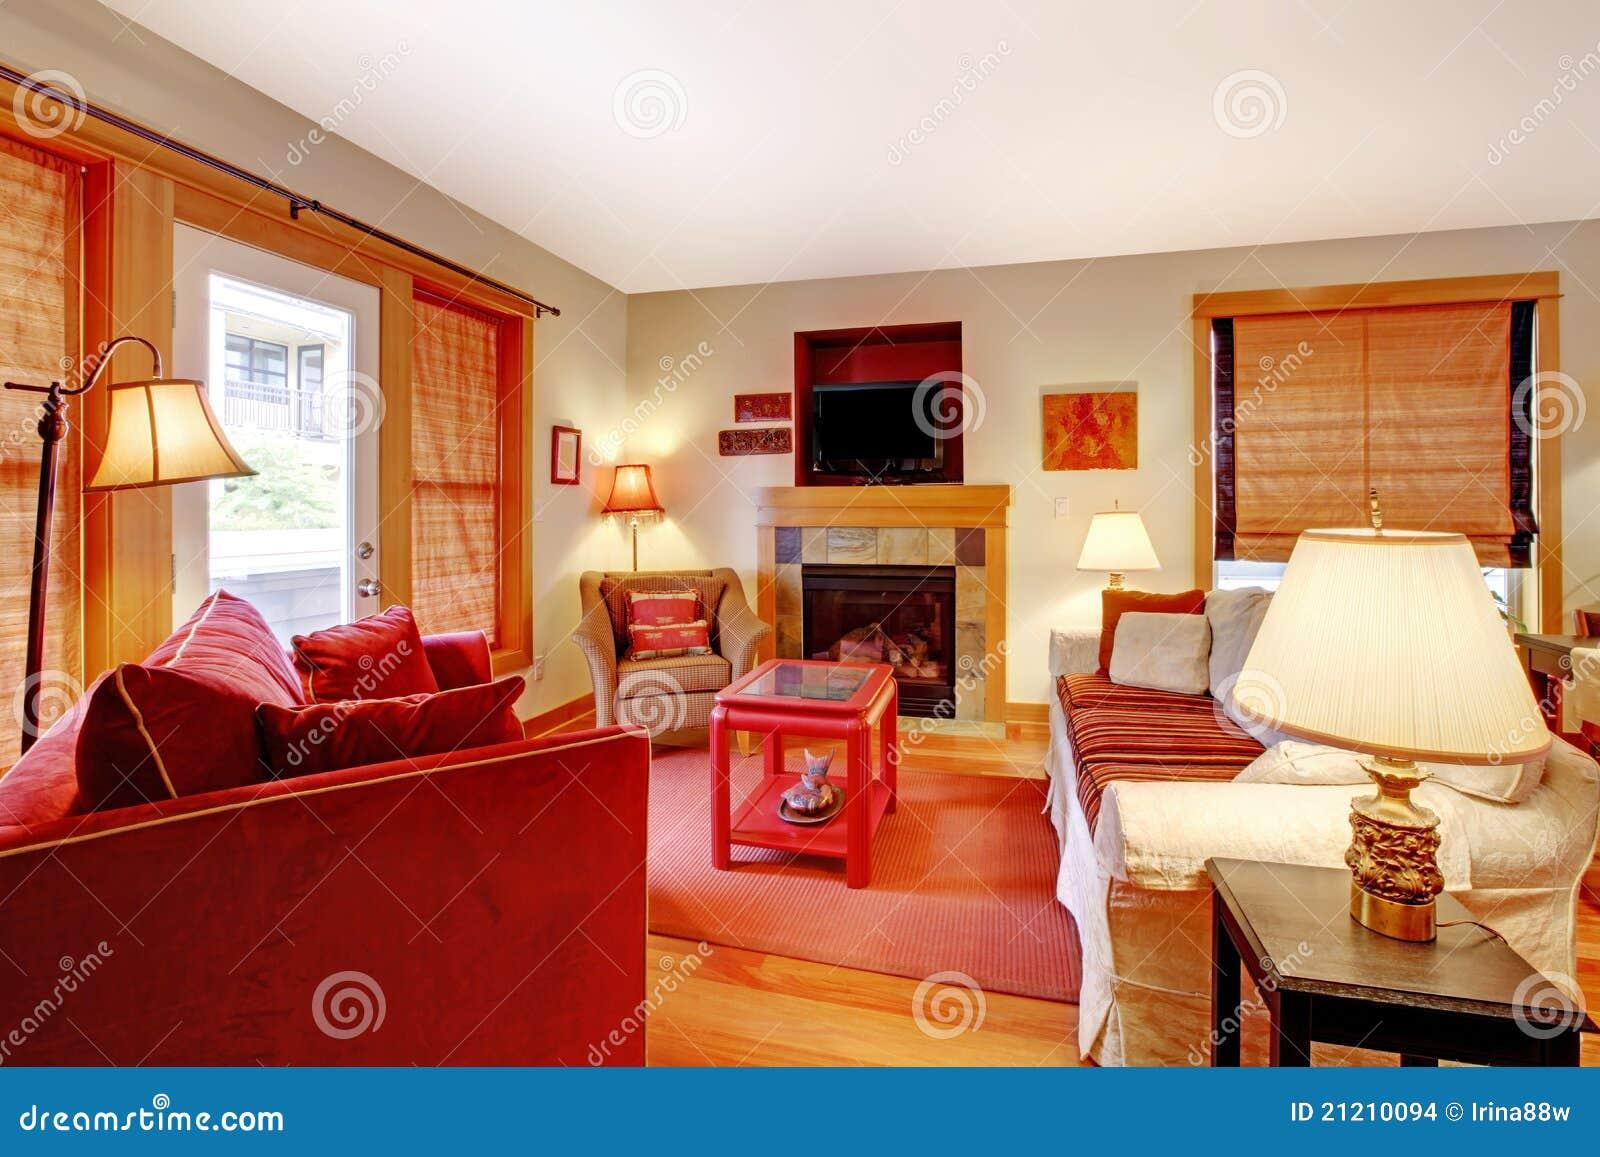 wohnzimmer mit rotem sofa. Black Bedroom Furniture Sets. Home Design Ideas